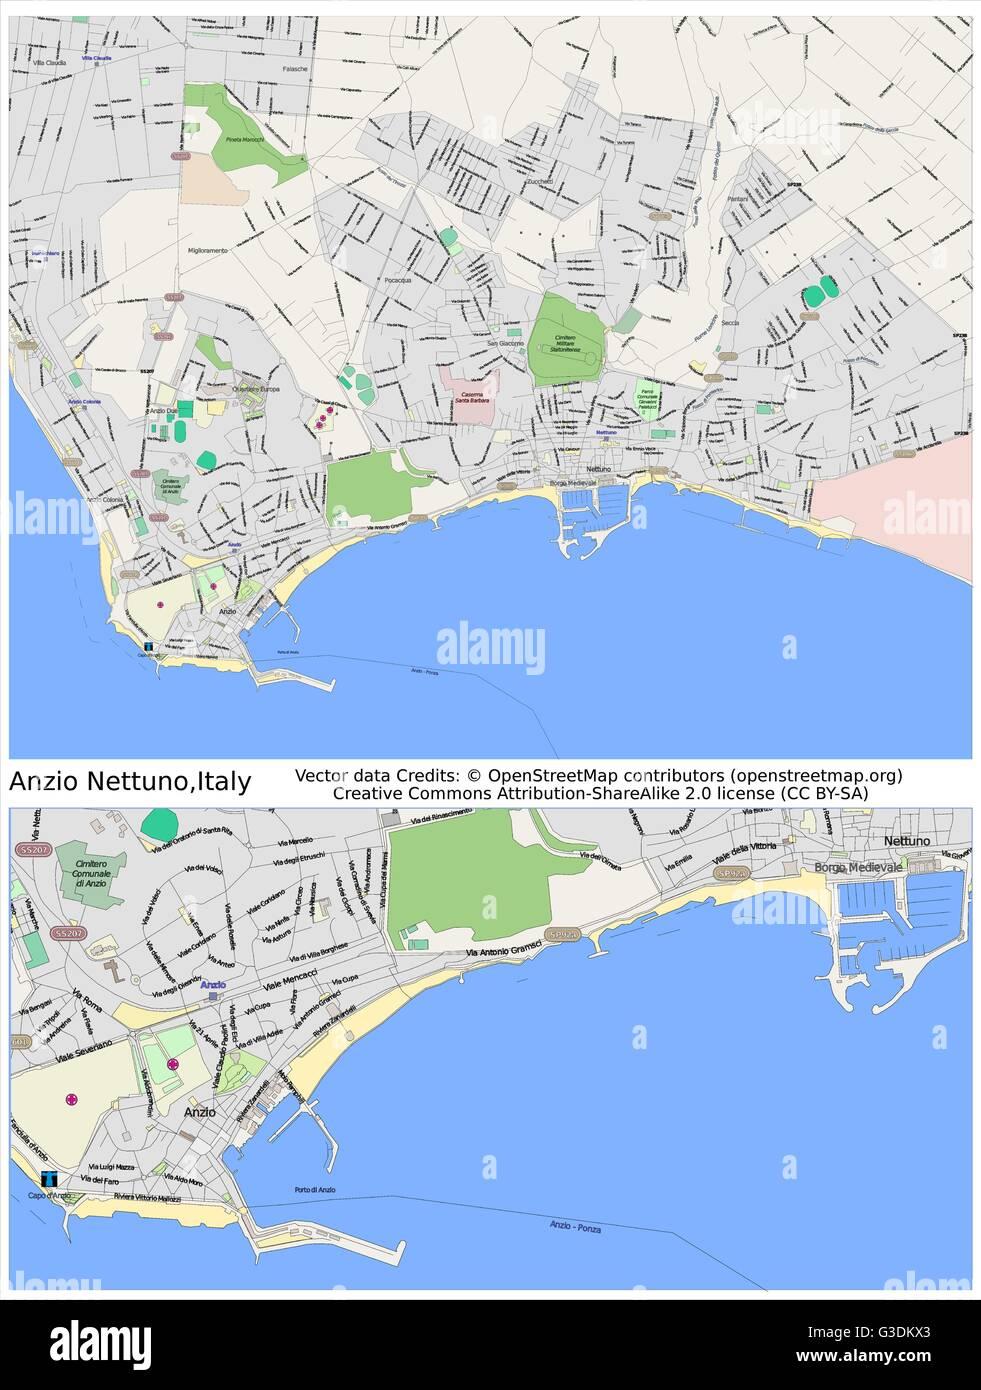 Anzio nettuno italy city map stock vector art illustration vector anzio nettuno italy city map thecheapjerseys Choice Image